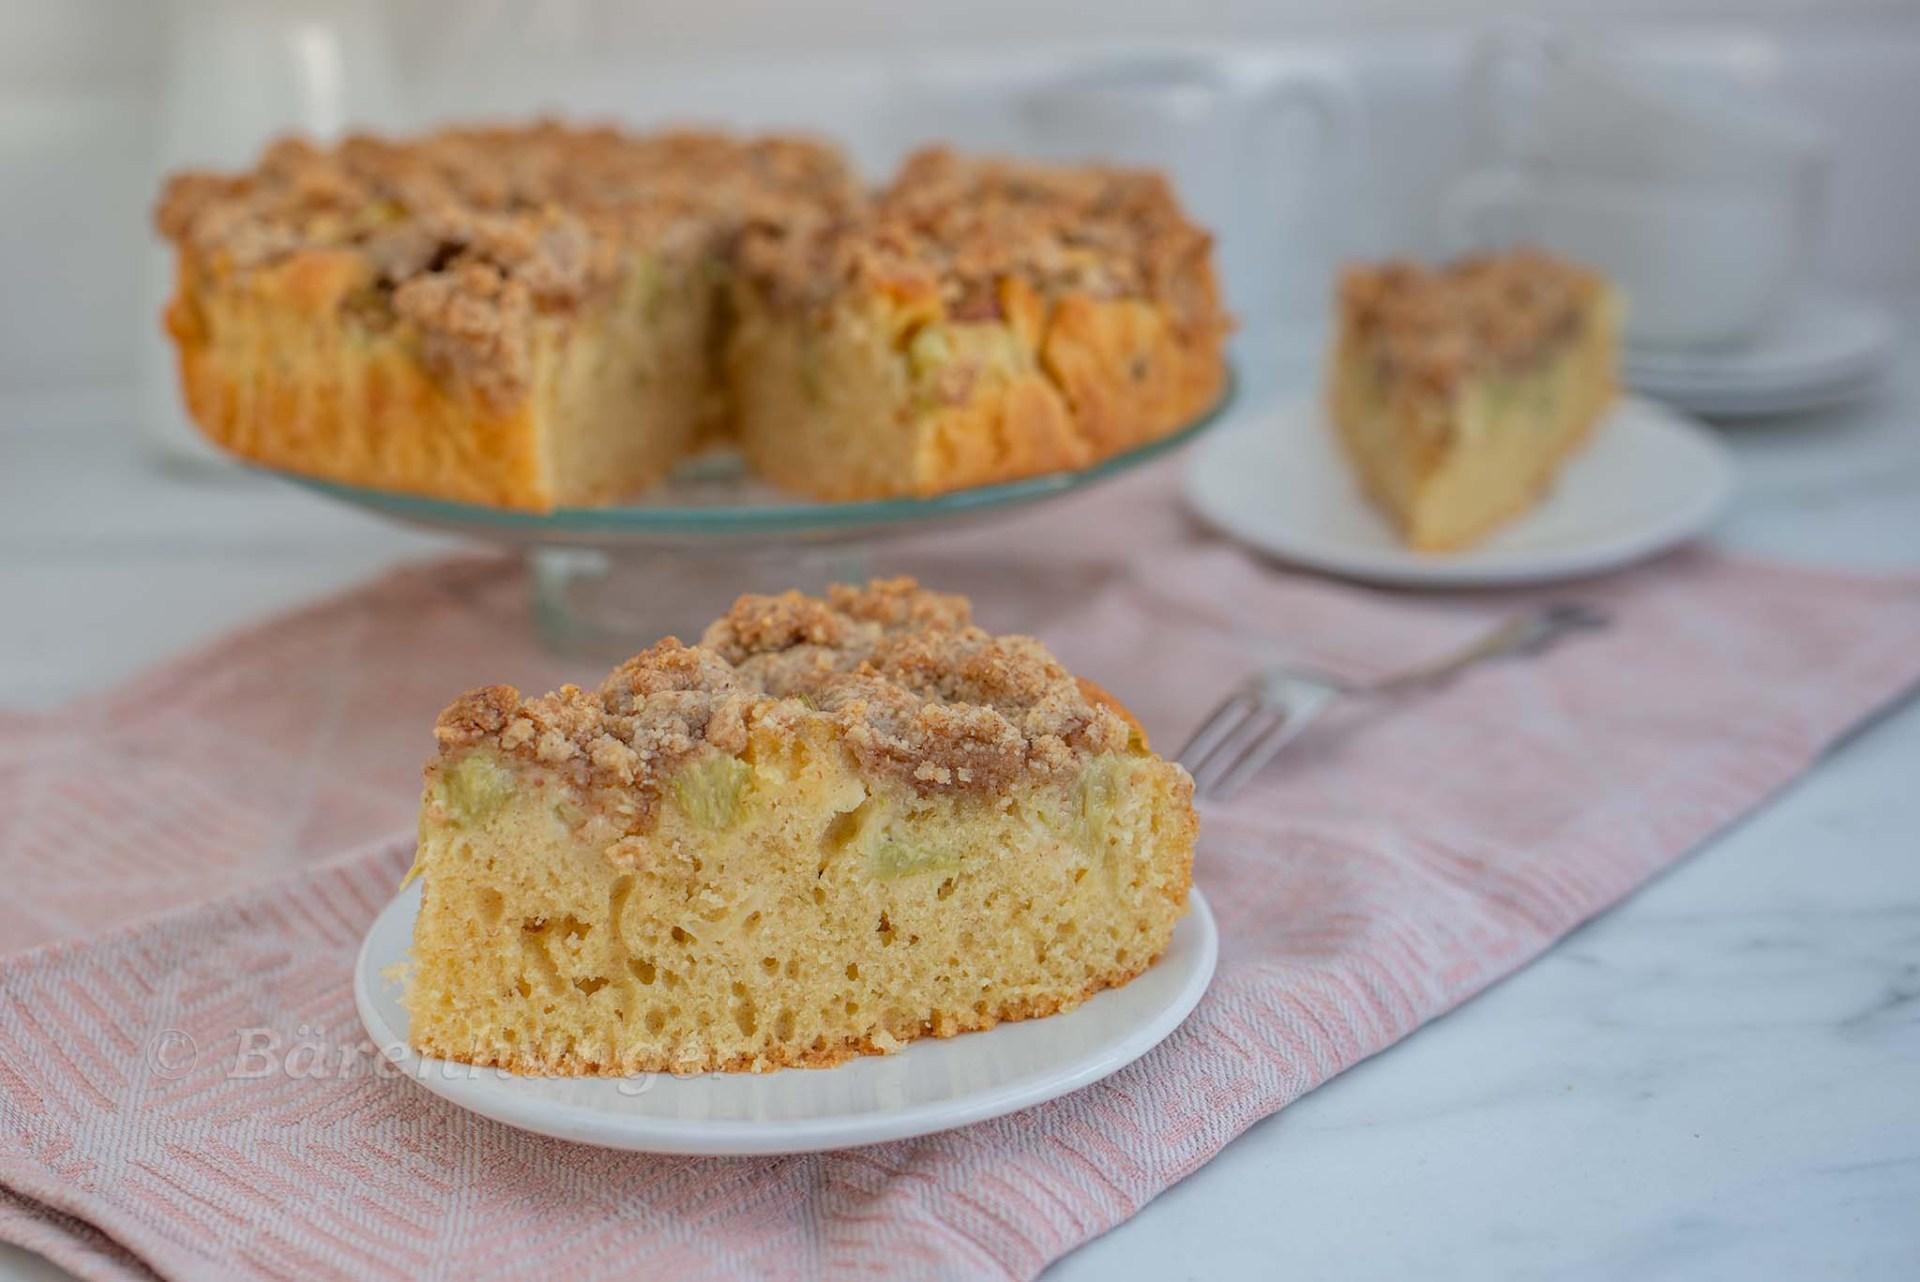 Sauerrahm Rhabarber Kuchen